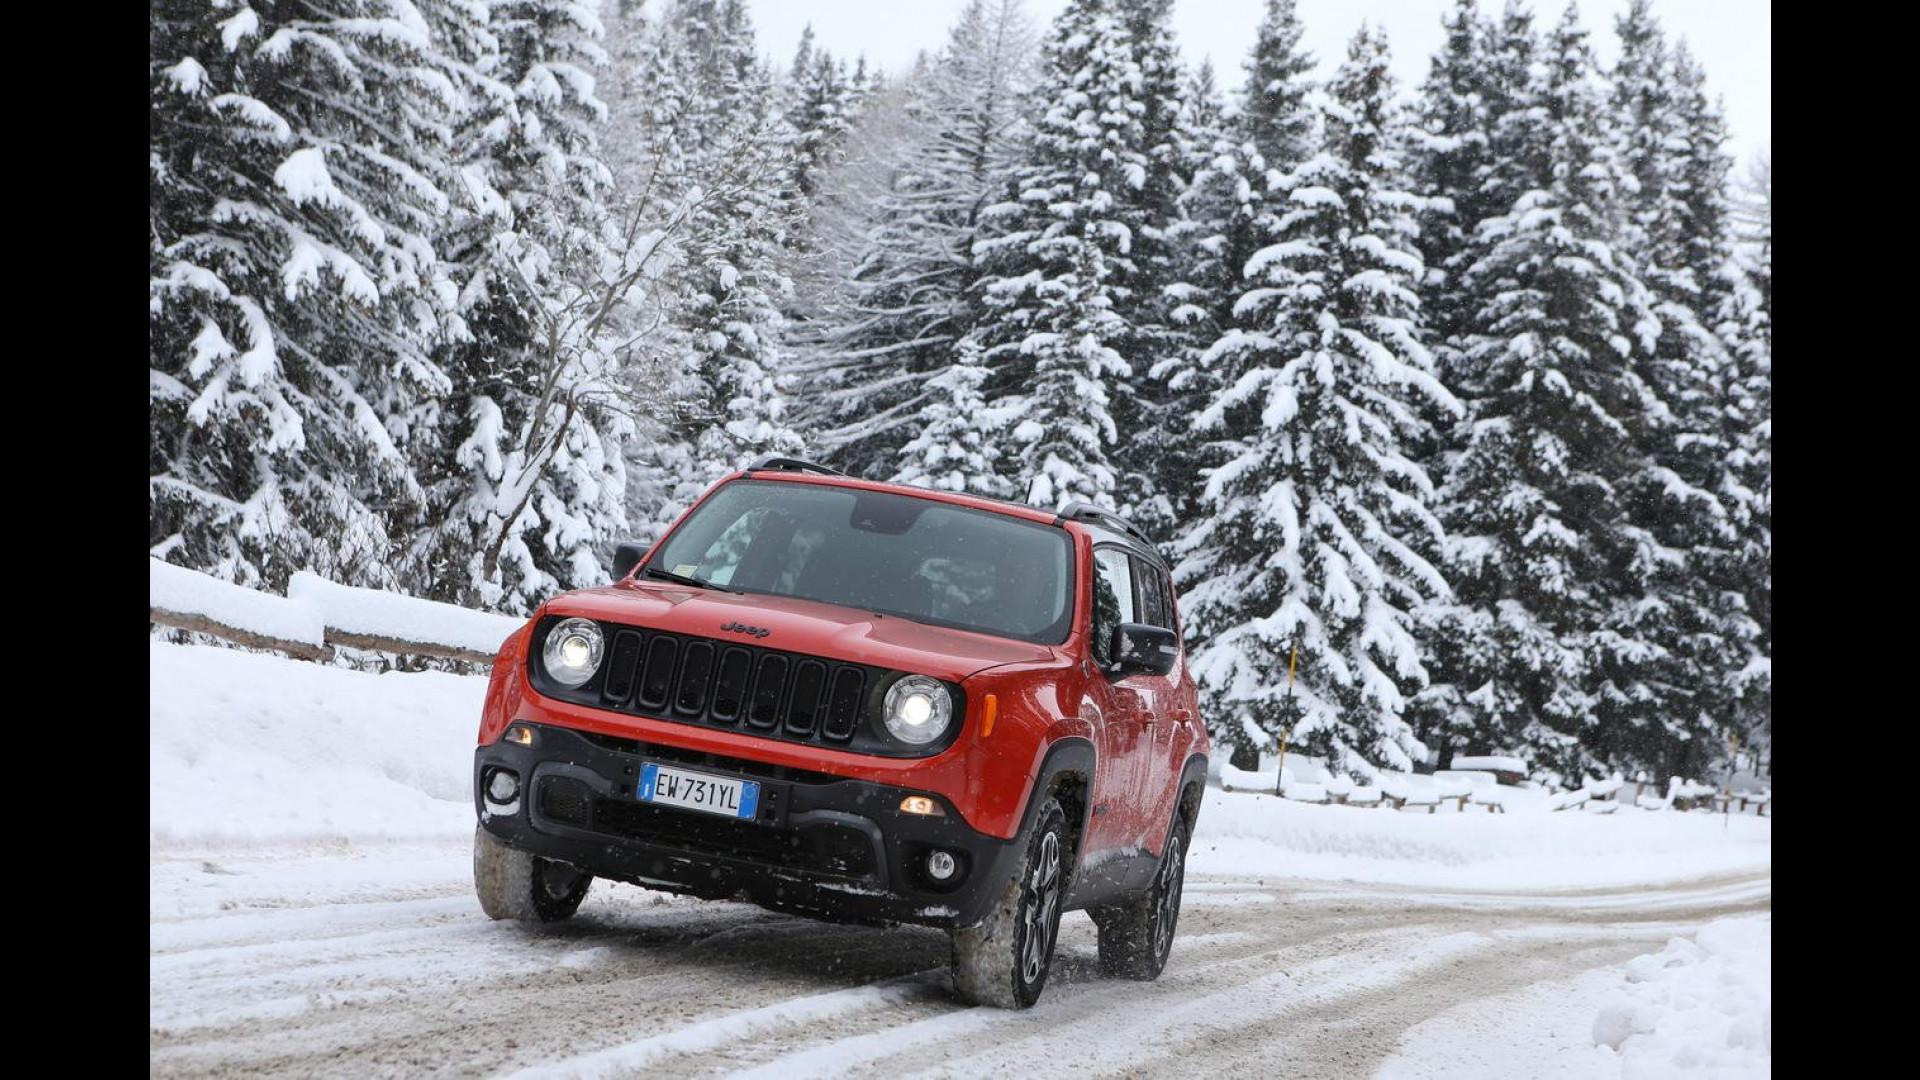 Fiat 500x E Jeep Renegade 4x4 Vs Svezia Video